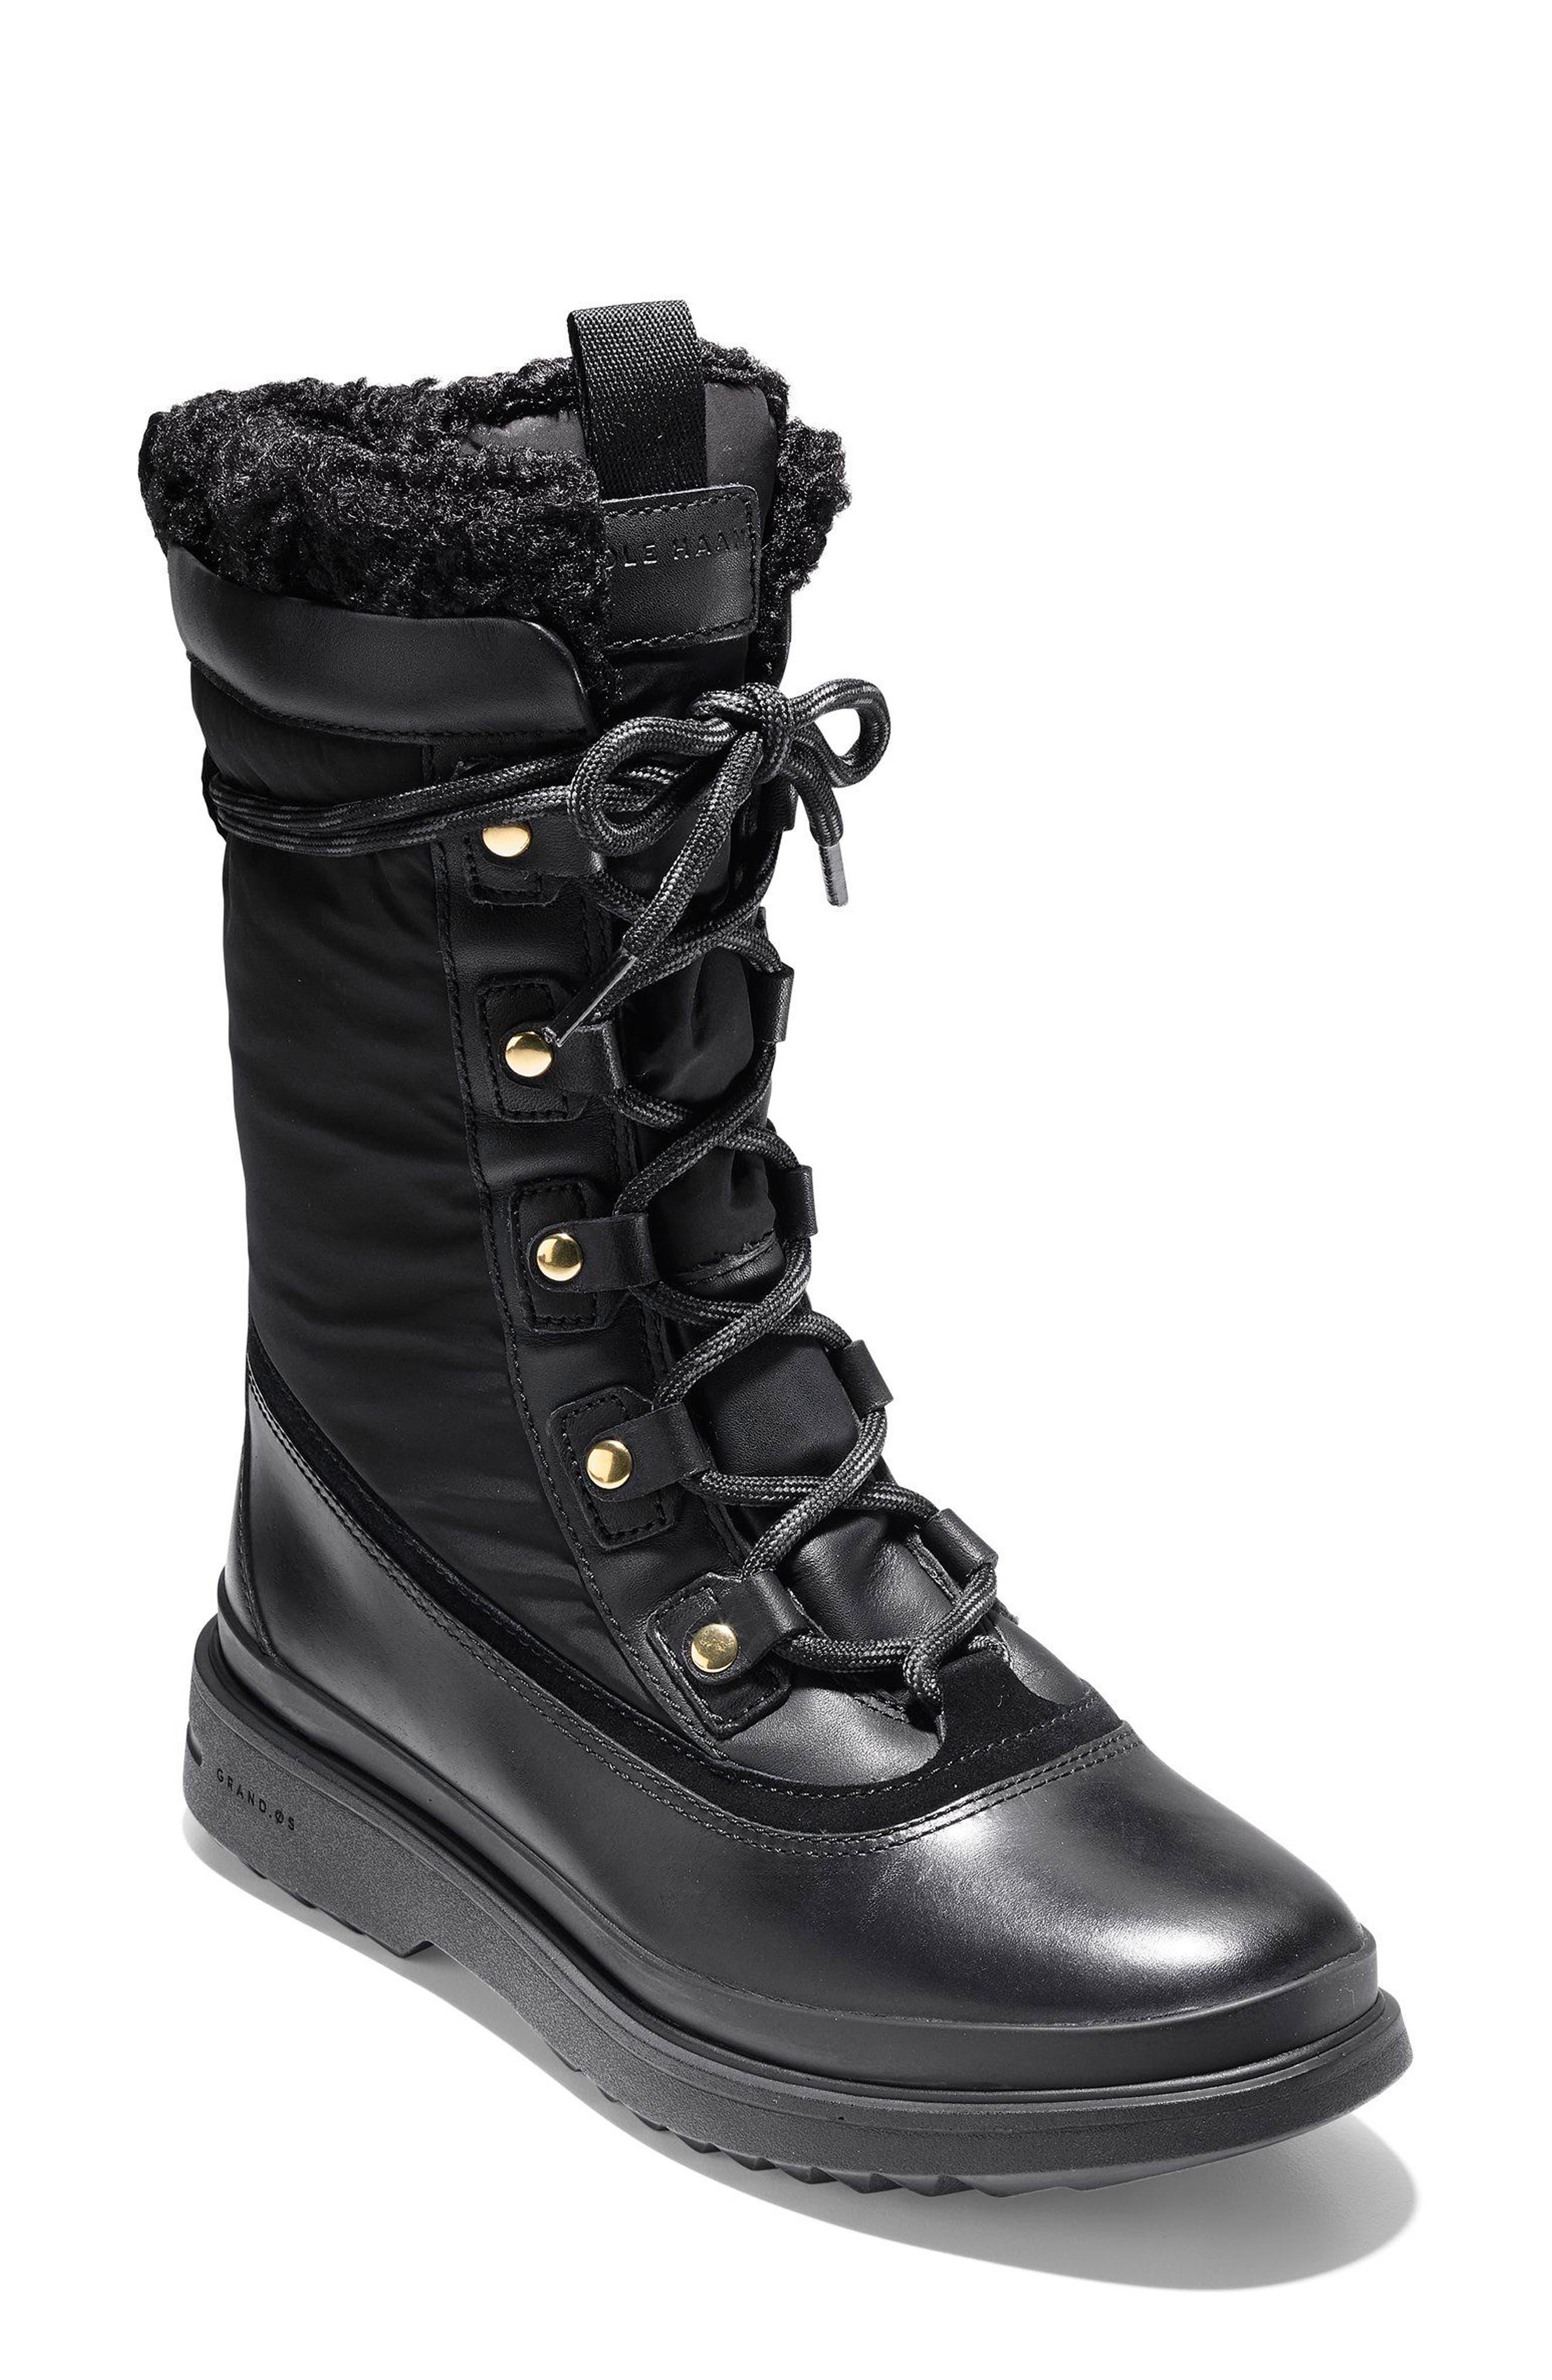 Millbridge Waterproof Boot,                         Main,                         color, Black Leather